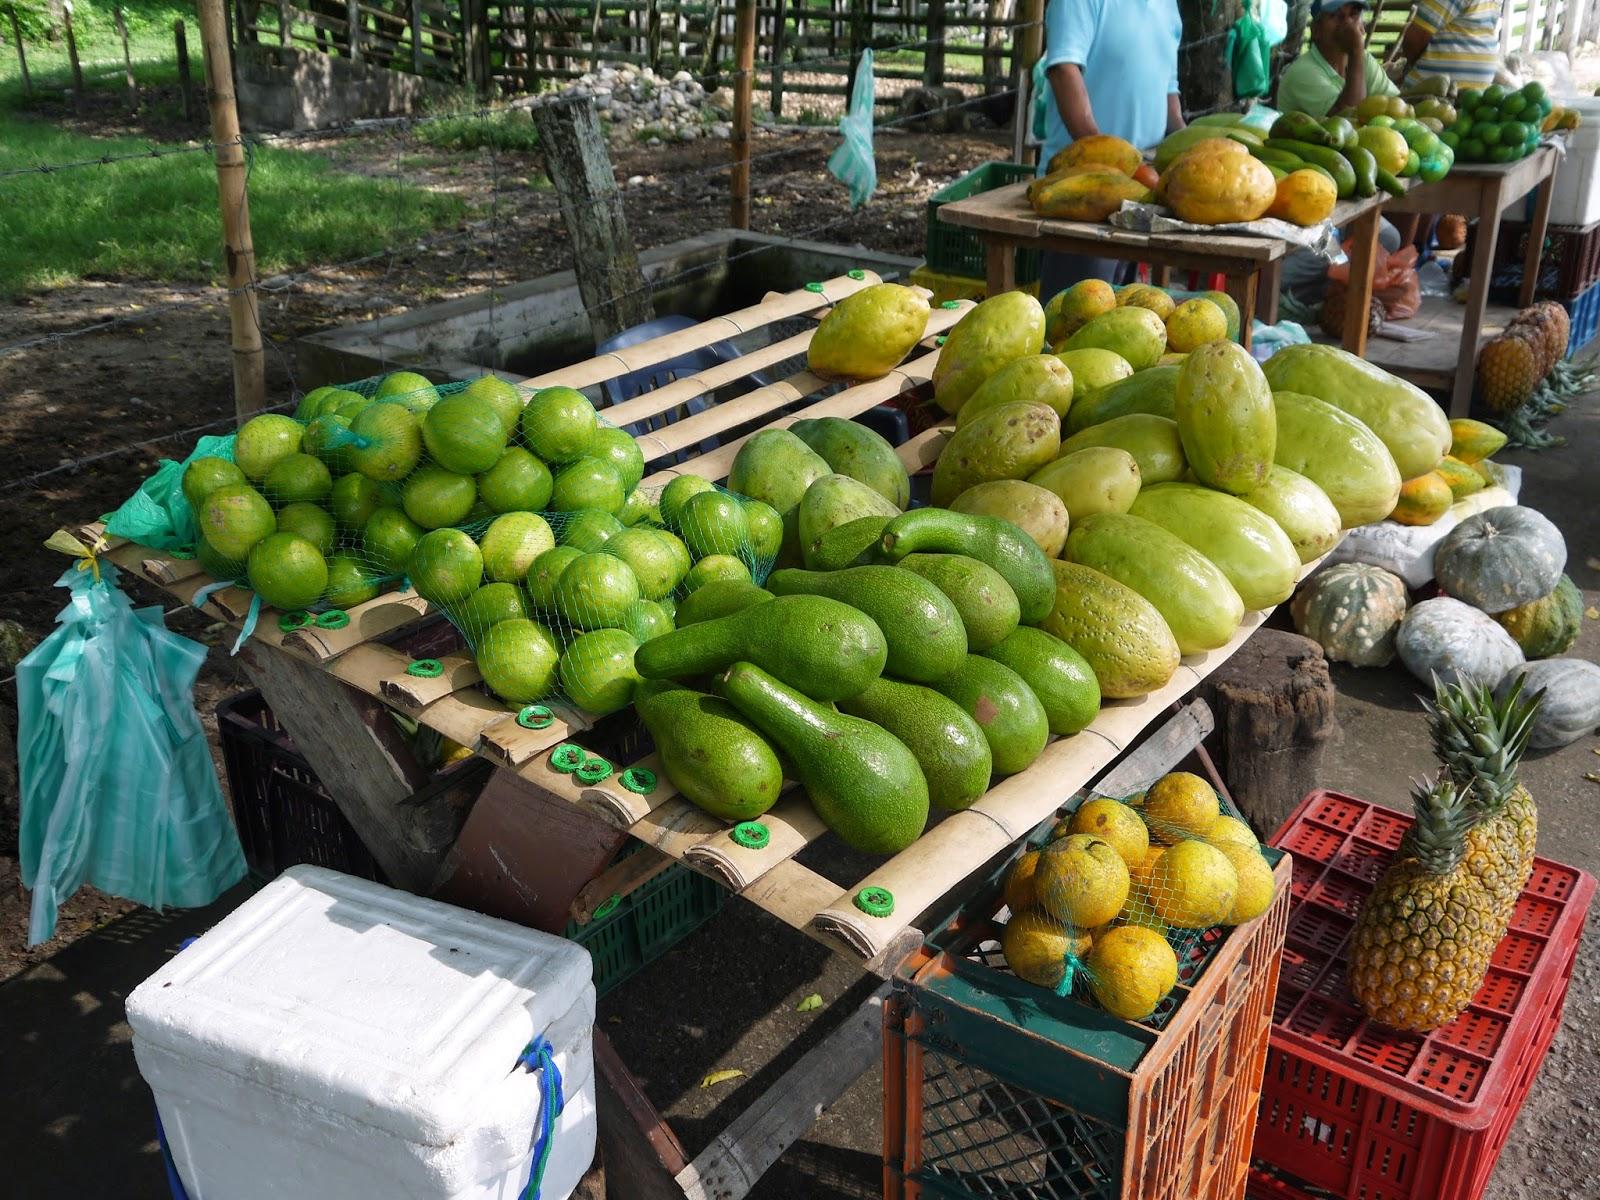 Fruta se venda